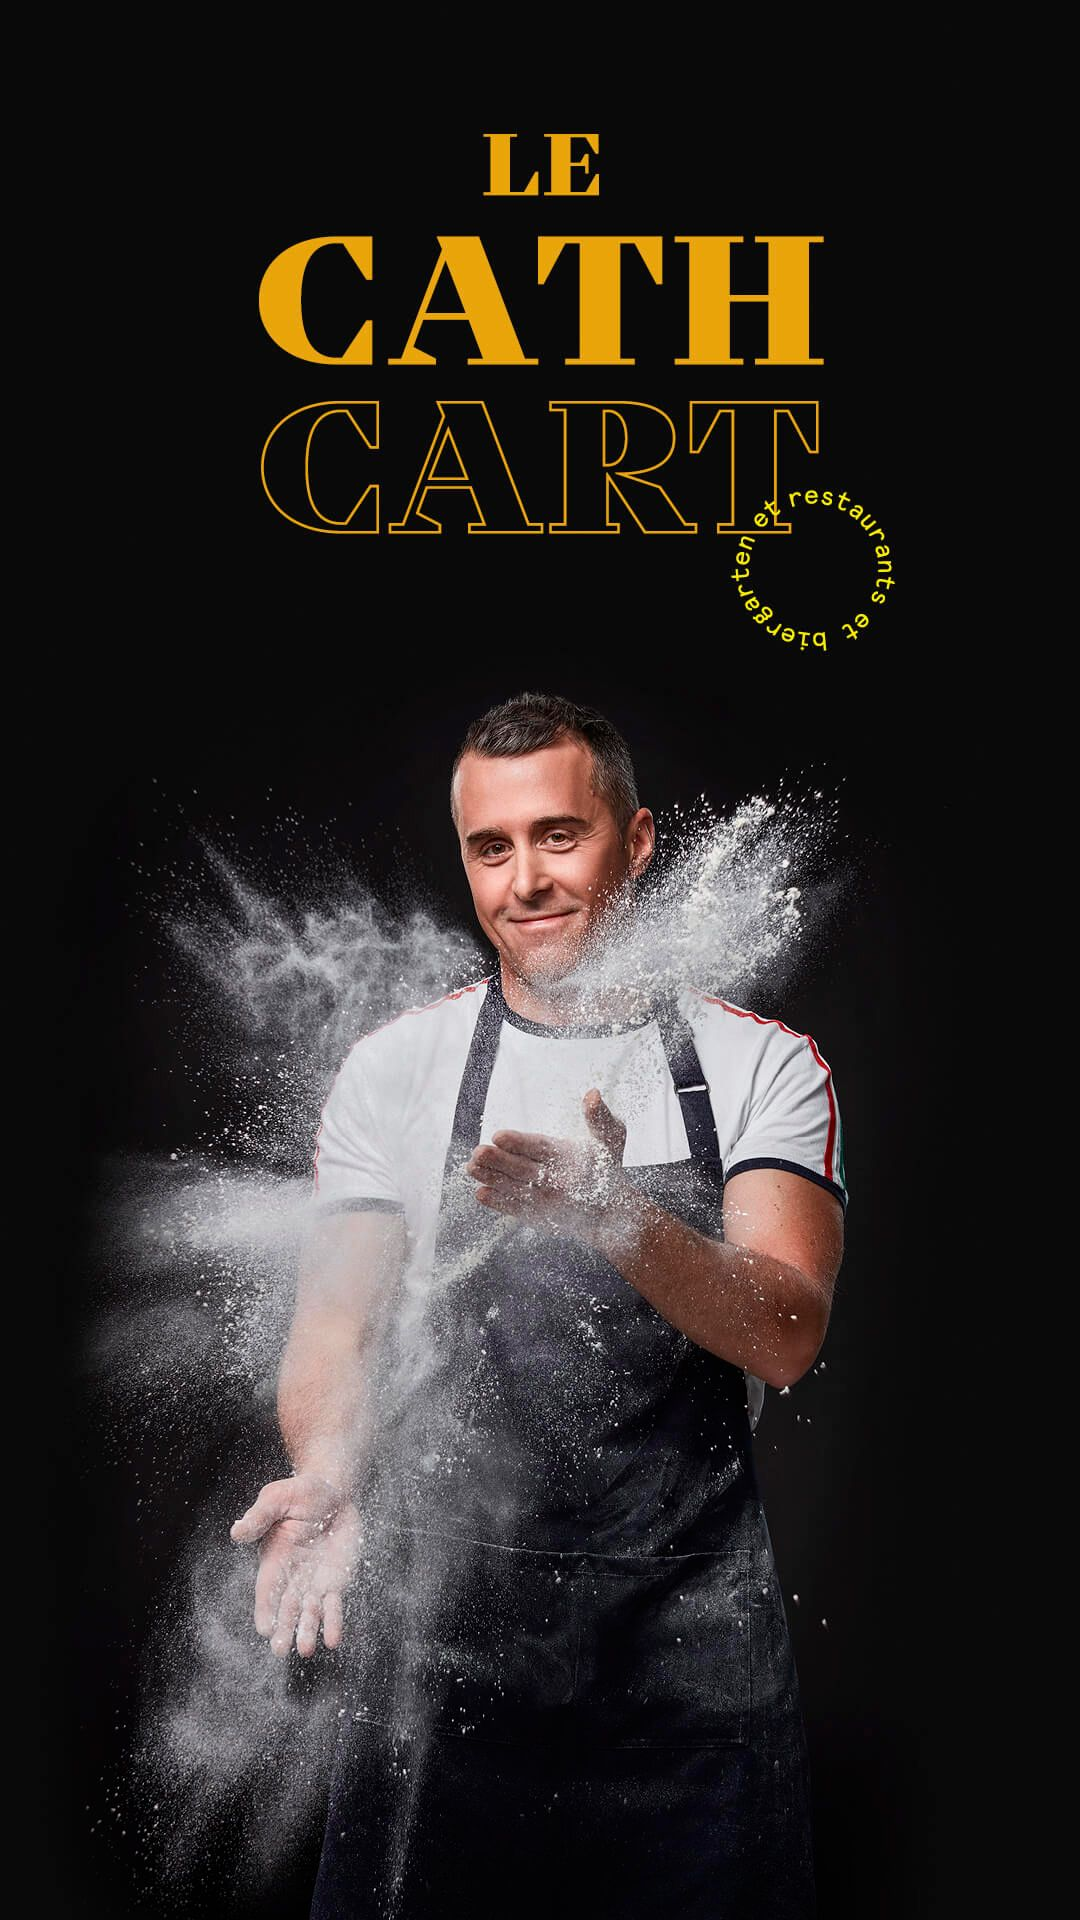 Federico Bianchi by Jocelyn Michel for Cathcart restaurant